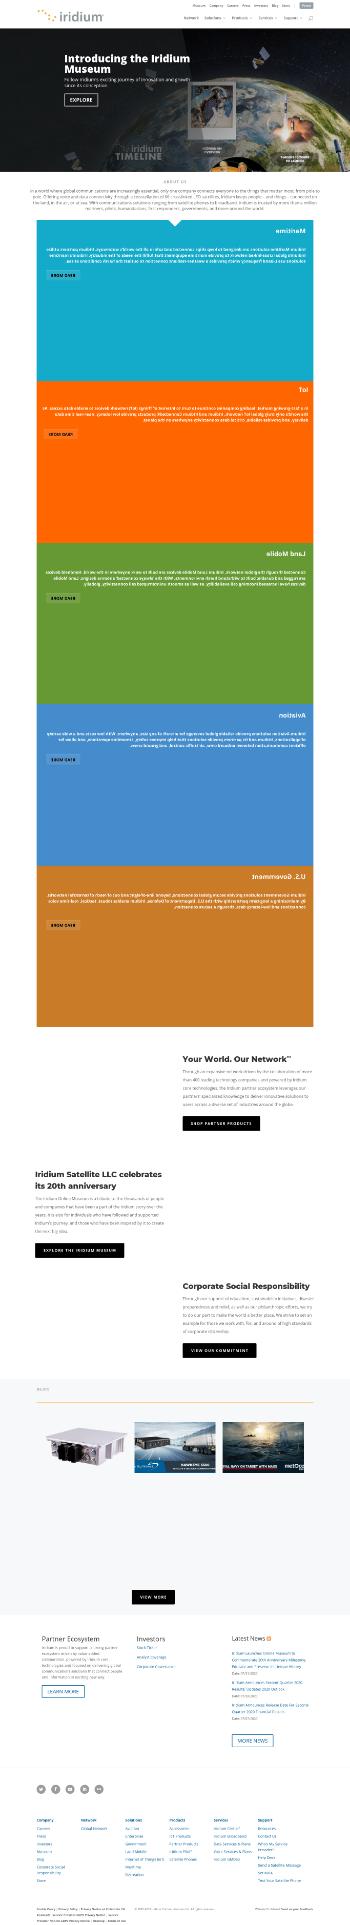 Iridium Communications Inc. Website Screenshot